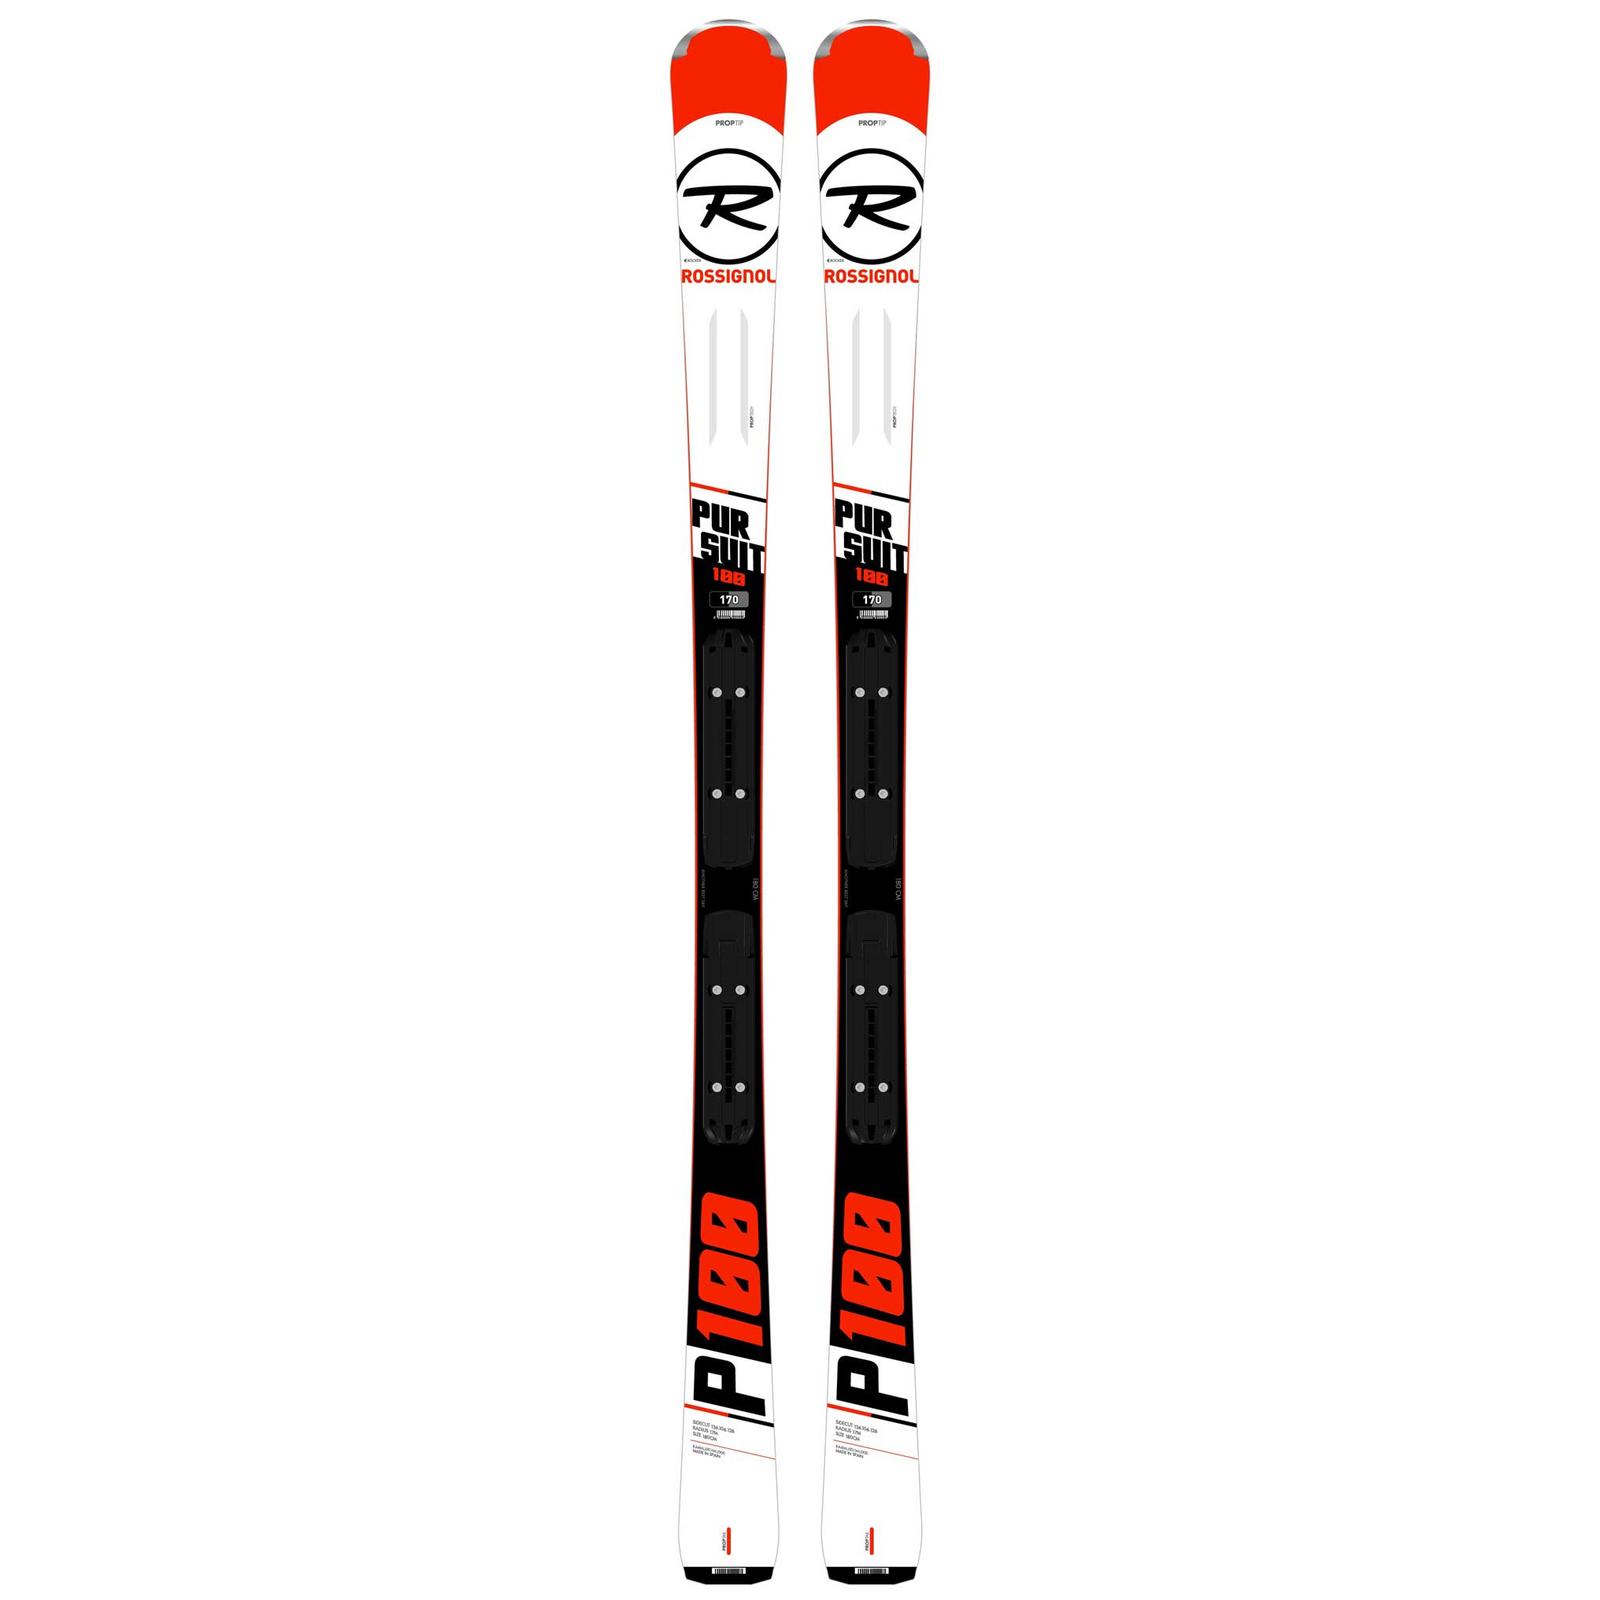 2d2140c6f Rossignol Pursuit 100 RTL Carving Ski 18/19 + XPRESS 10 B83 Bindung -  mydealz.de